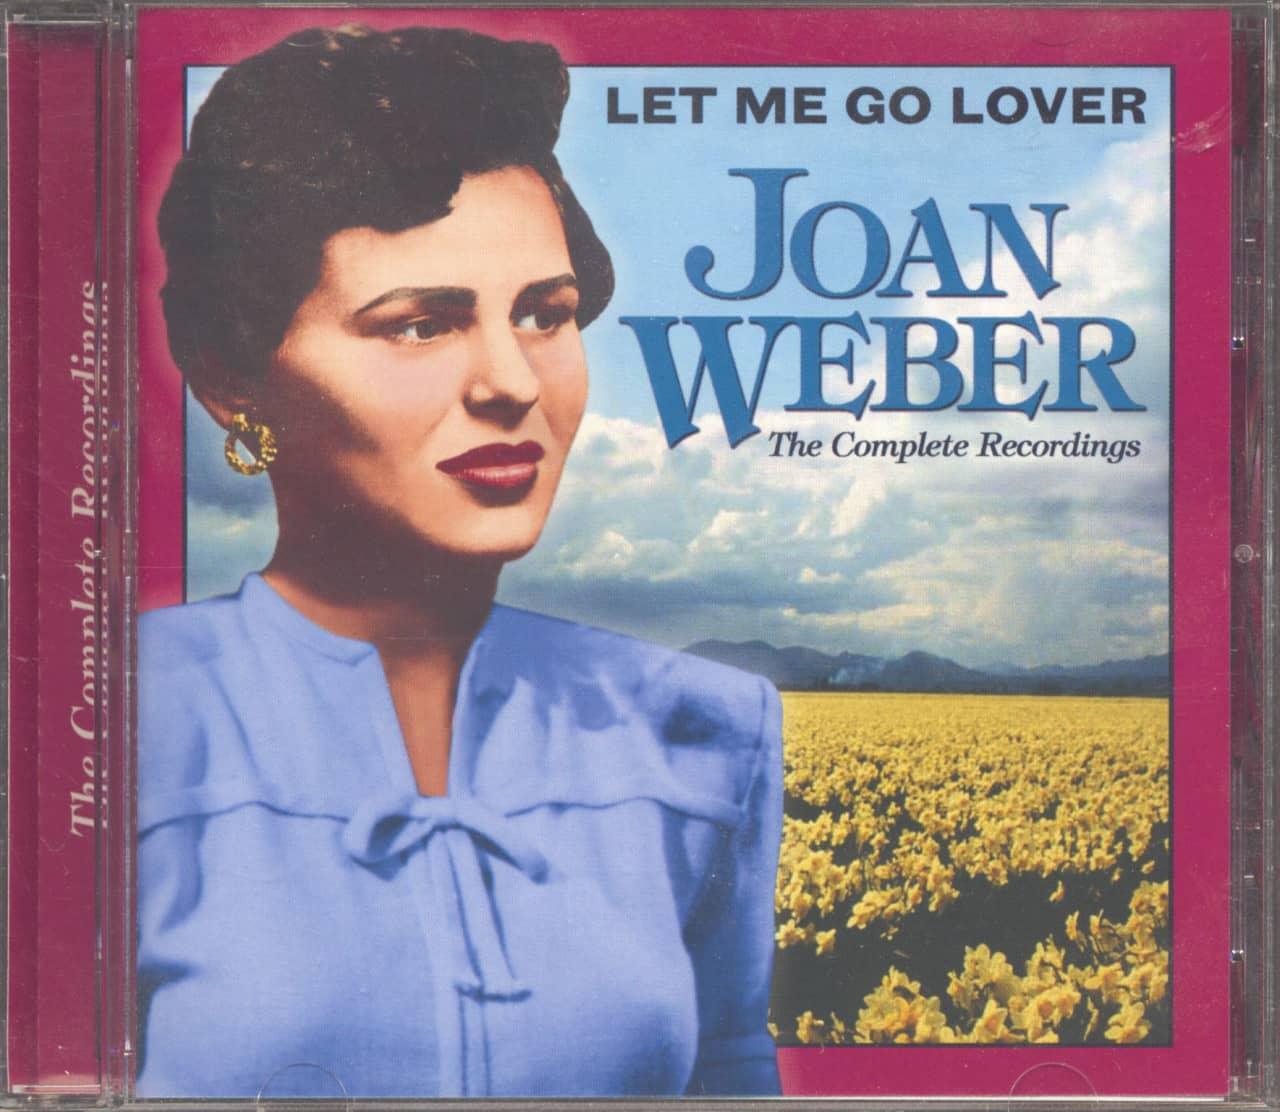 Joan Weber - Let Me Go Lover - The Complete Recordings (CD)